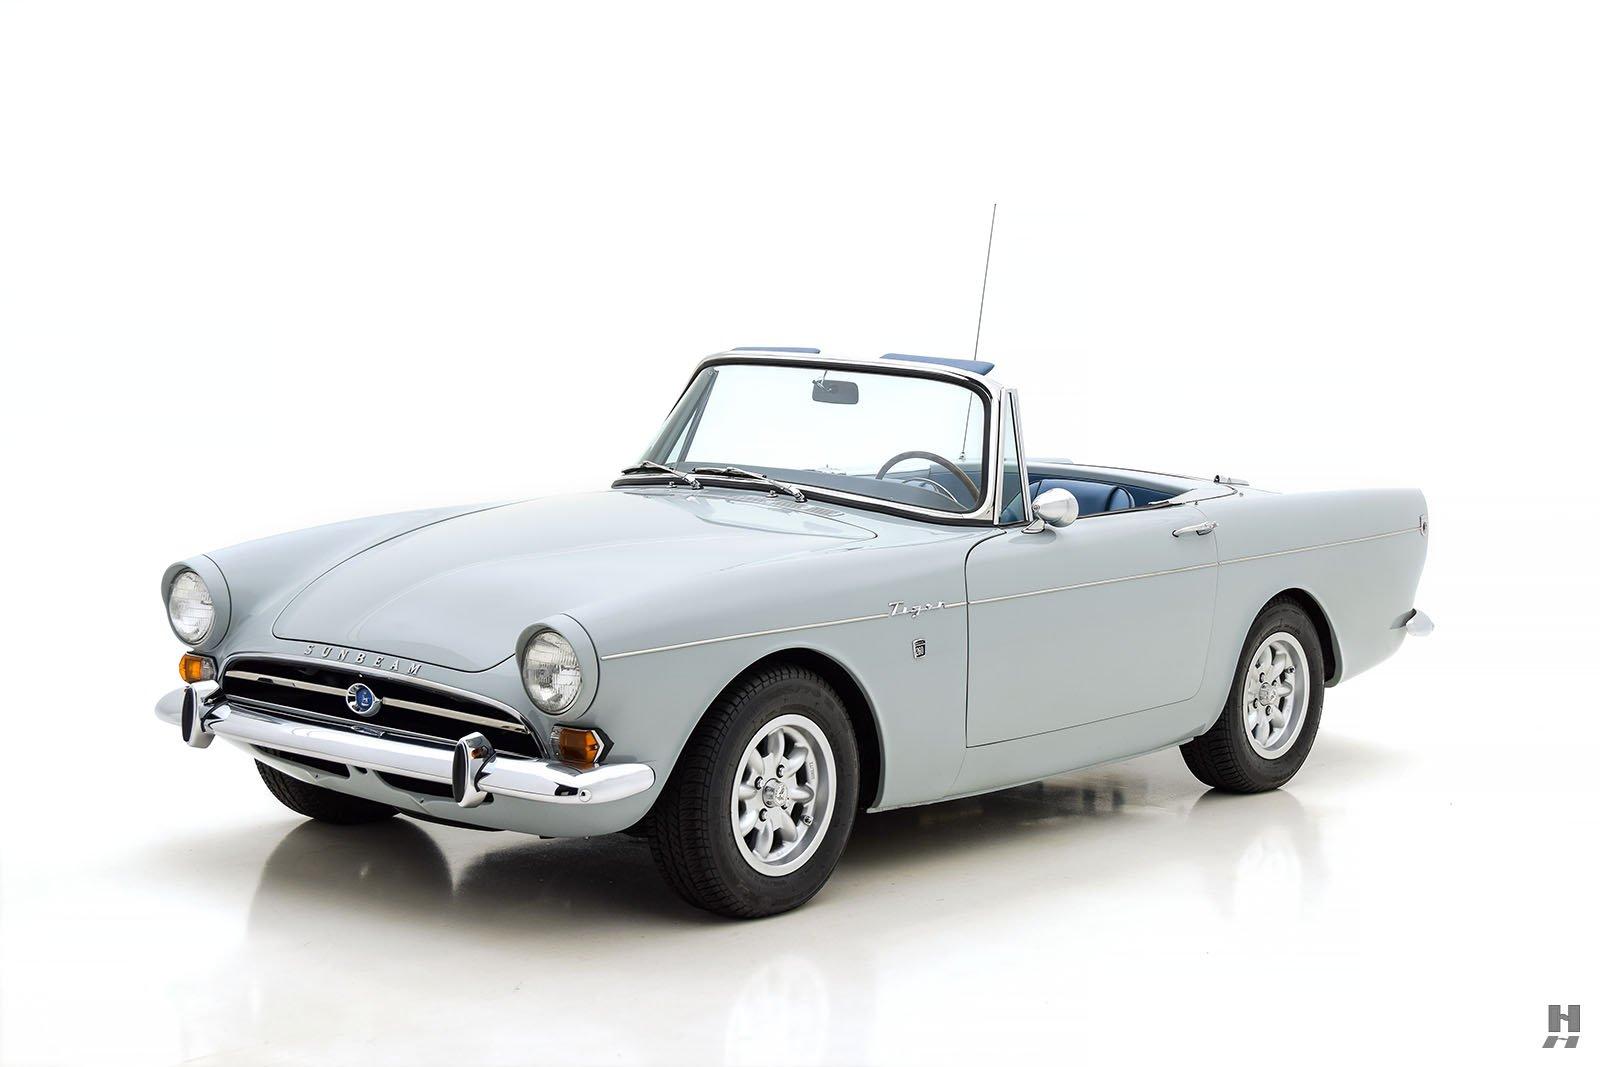 1965 Sunbeam Tiger Roadster For Sale By Hyman LTD